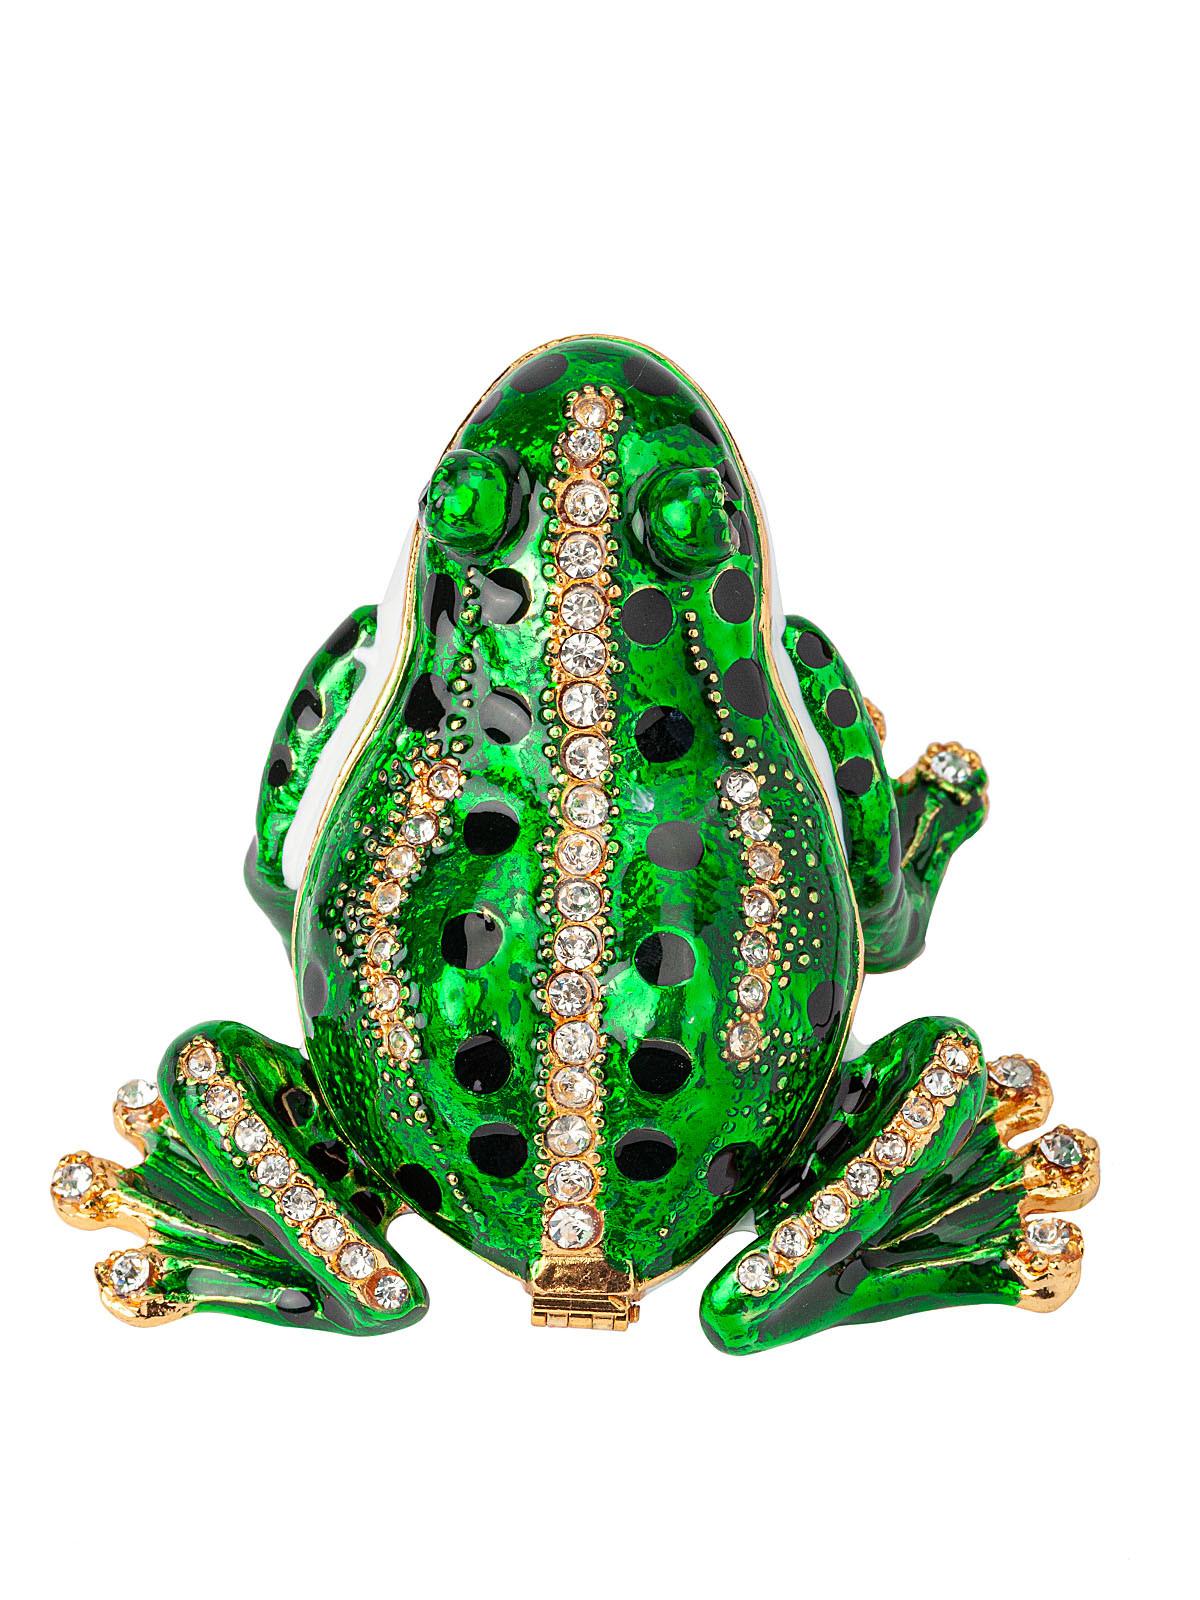 Шкатулка для украшений Лягушка S-3244 зеленый